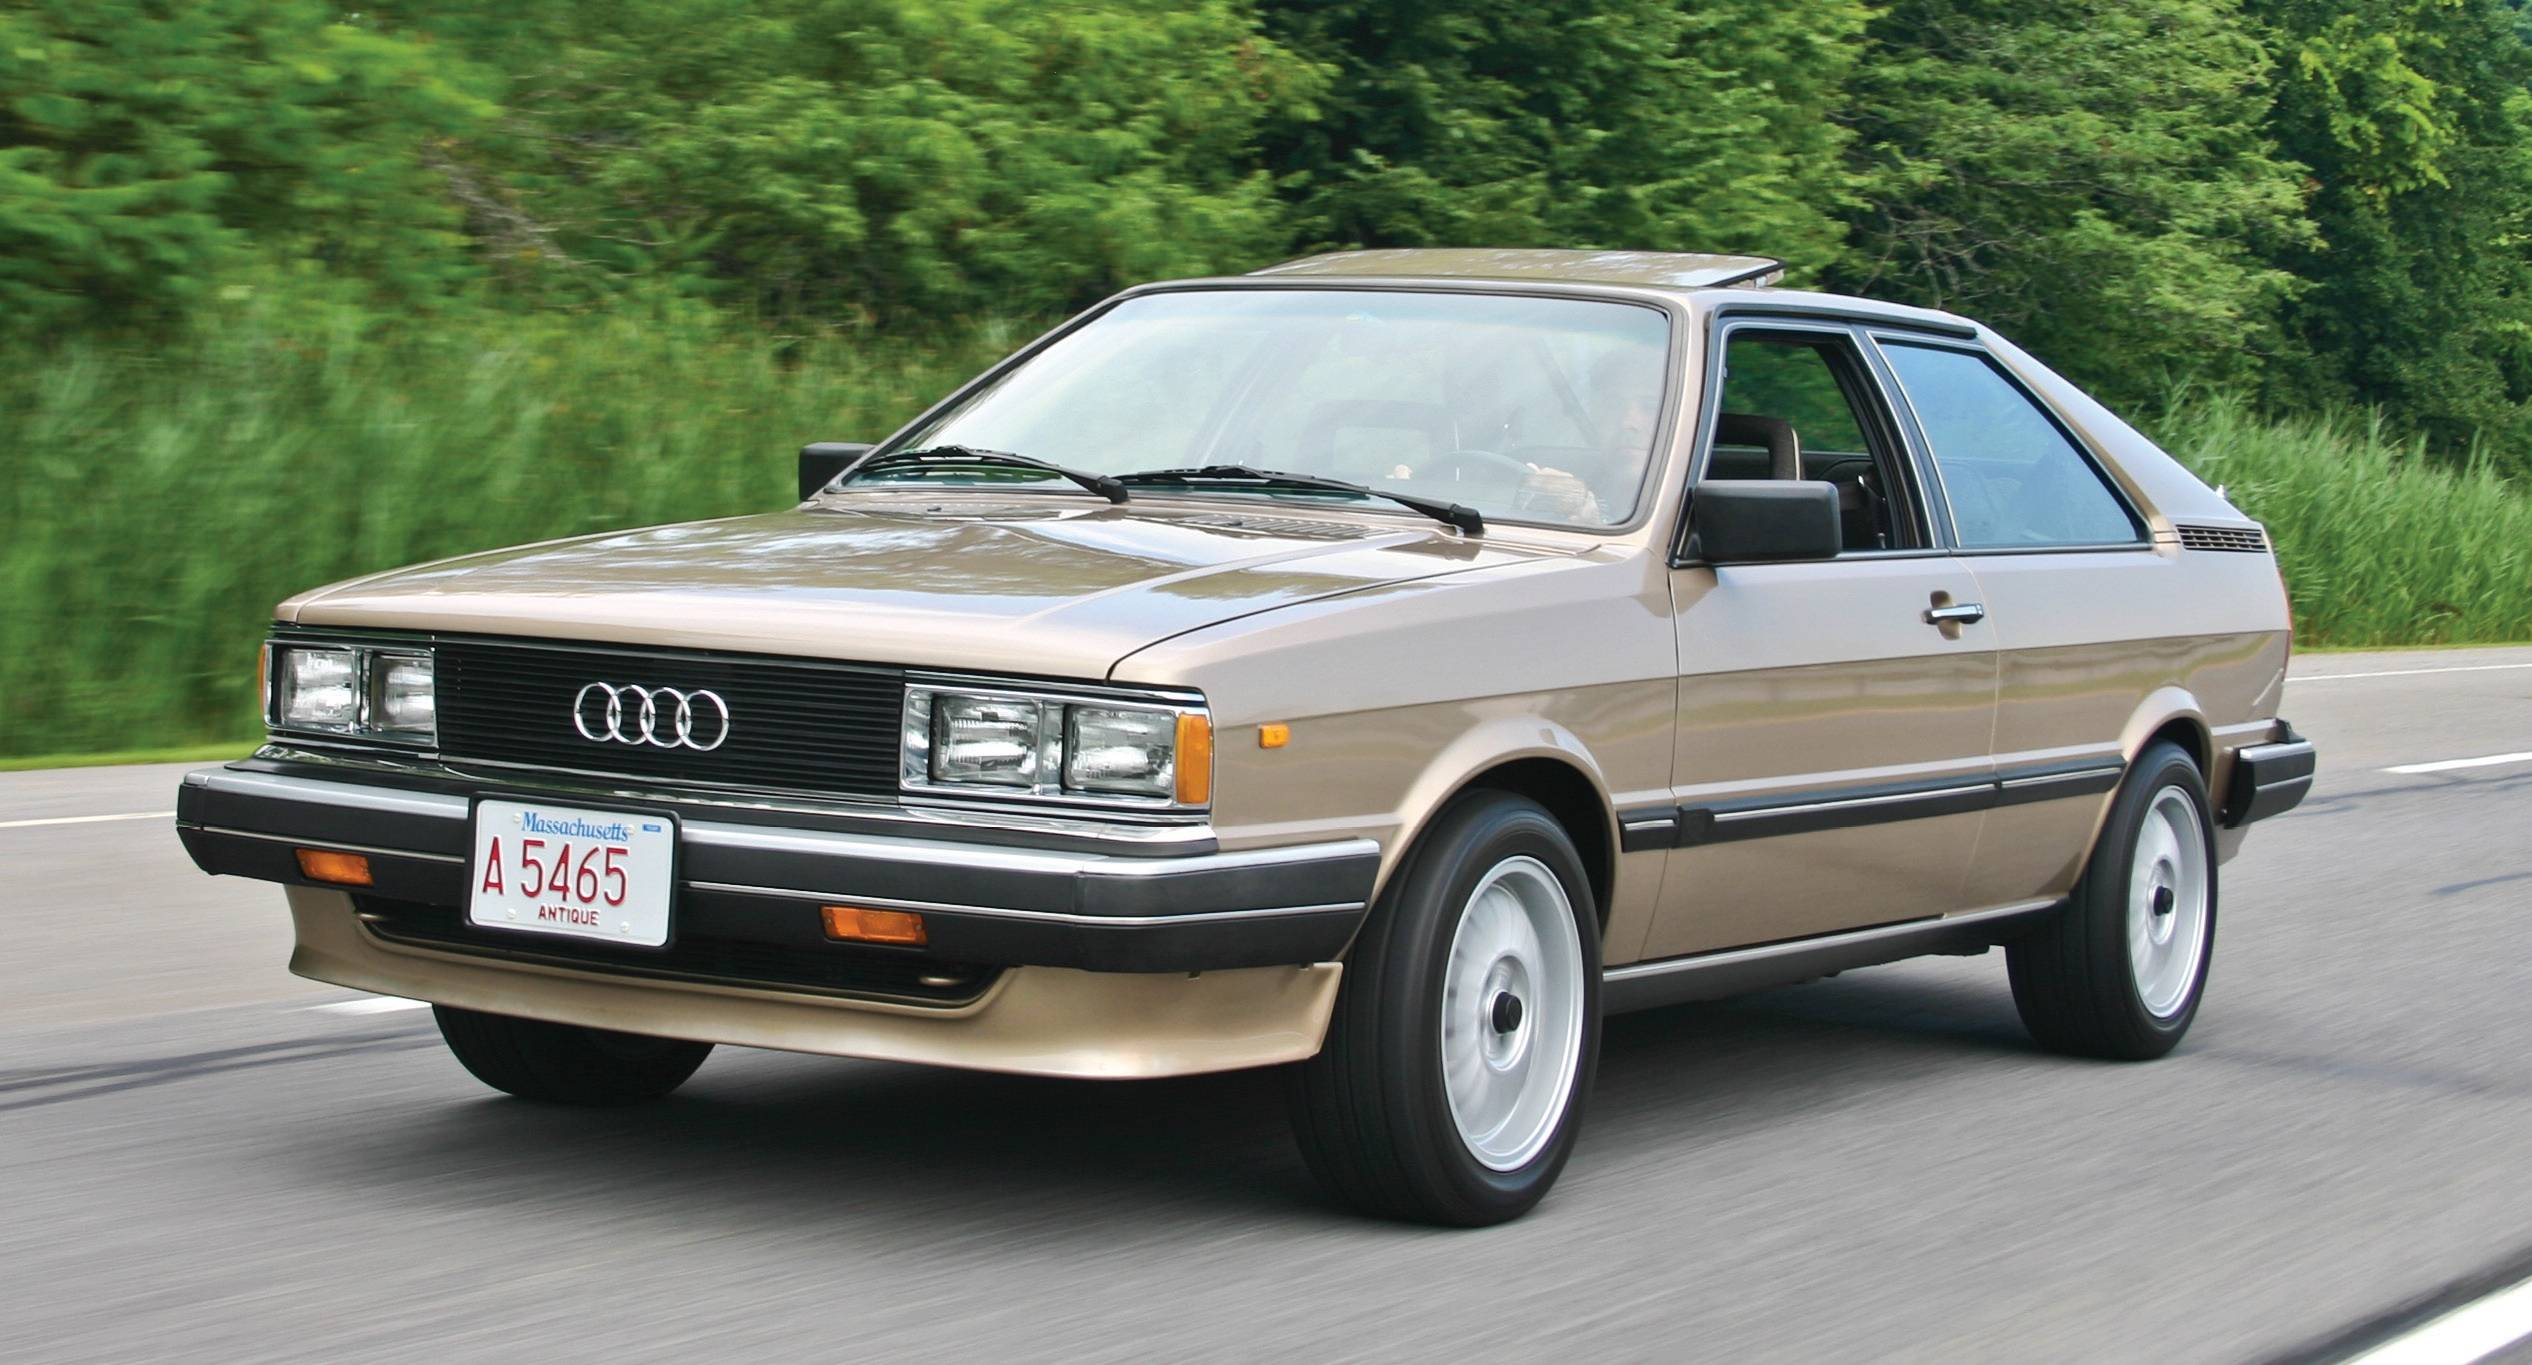 Audi Coupe GT 1981 hemmingsmotornews com  625163-2532-0@2x